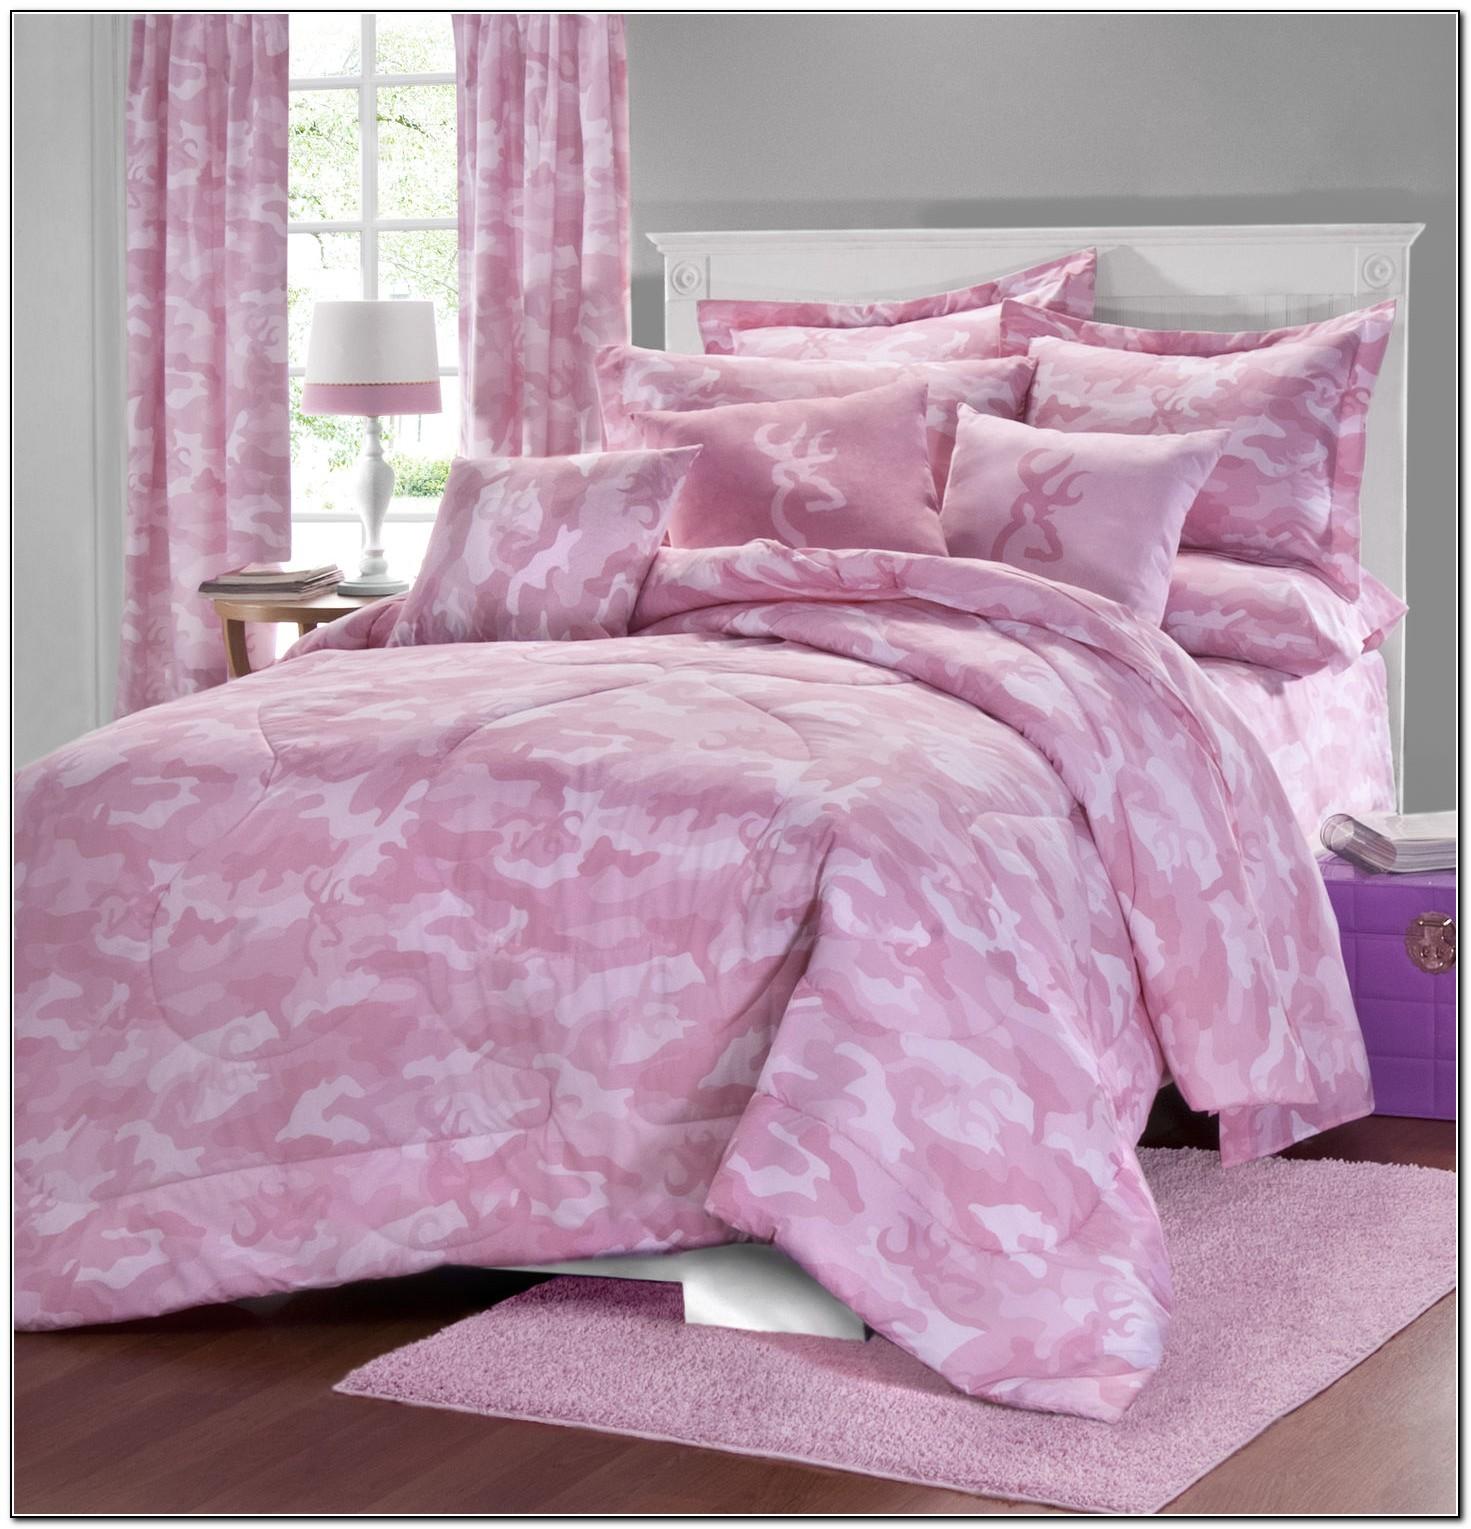 Pink Camouflage Bedding Sets